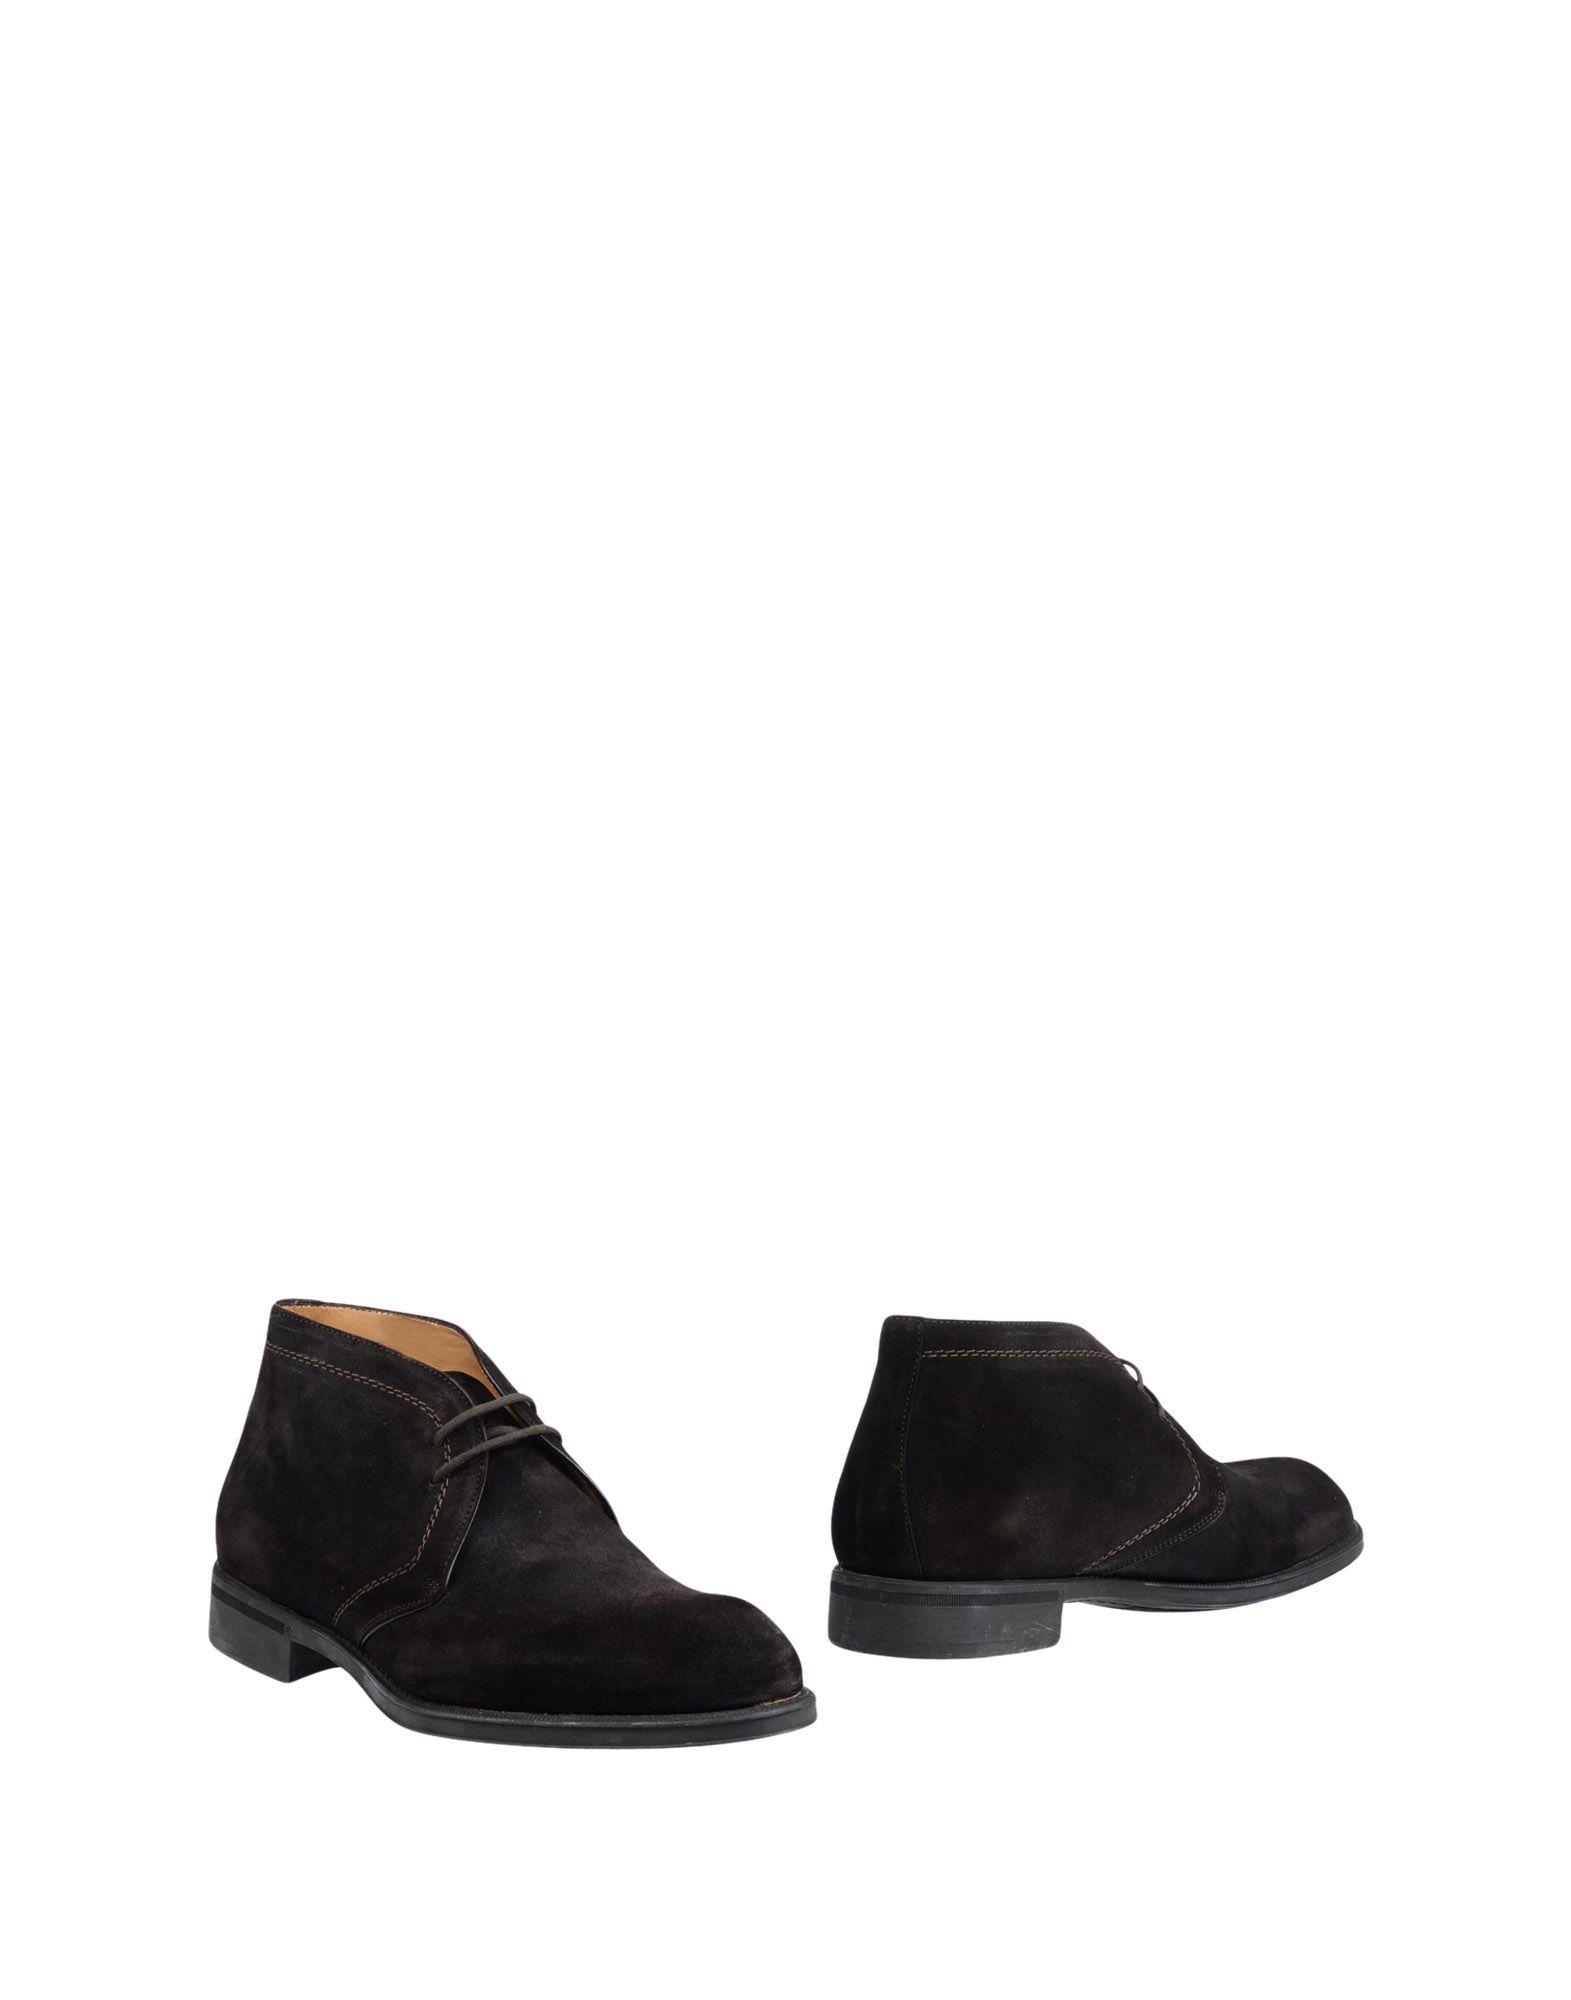 FRATELLI PELUSO Полусапоги и высокие ботинки цены онлайн